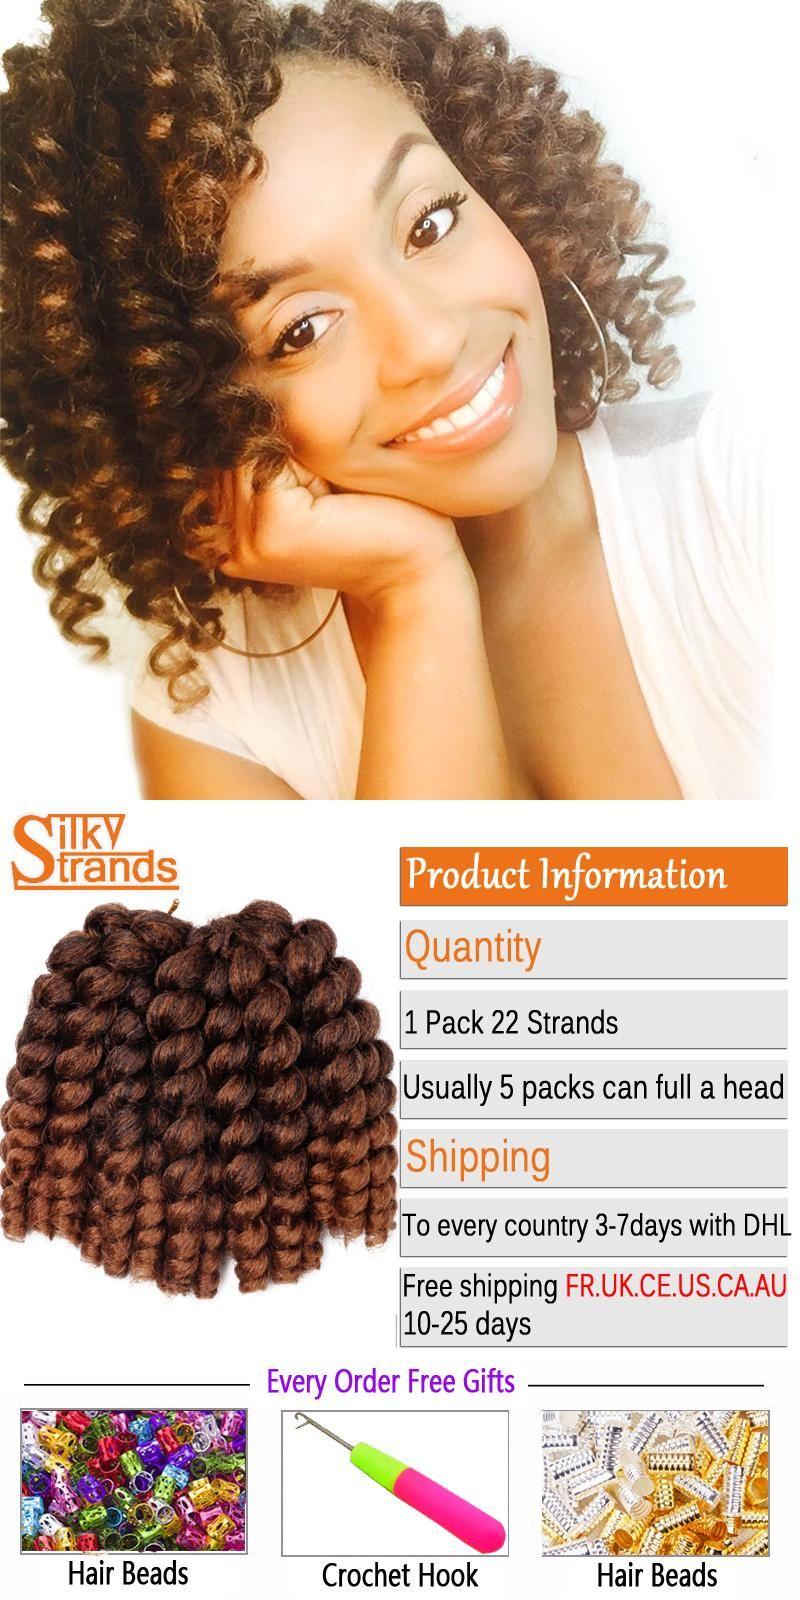 Silky Strands Ombre Jumby Wand Curls Twist Crochet Hair Extensions